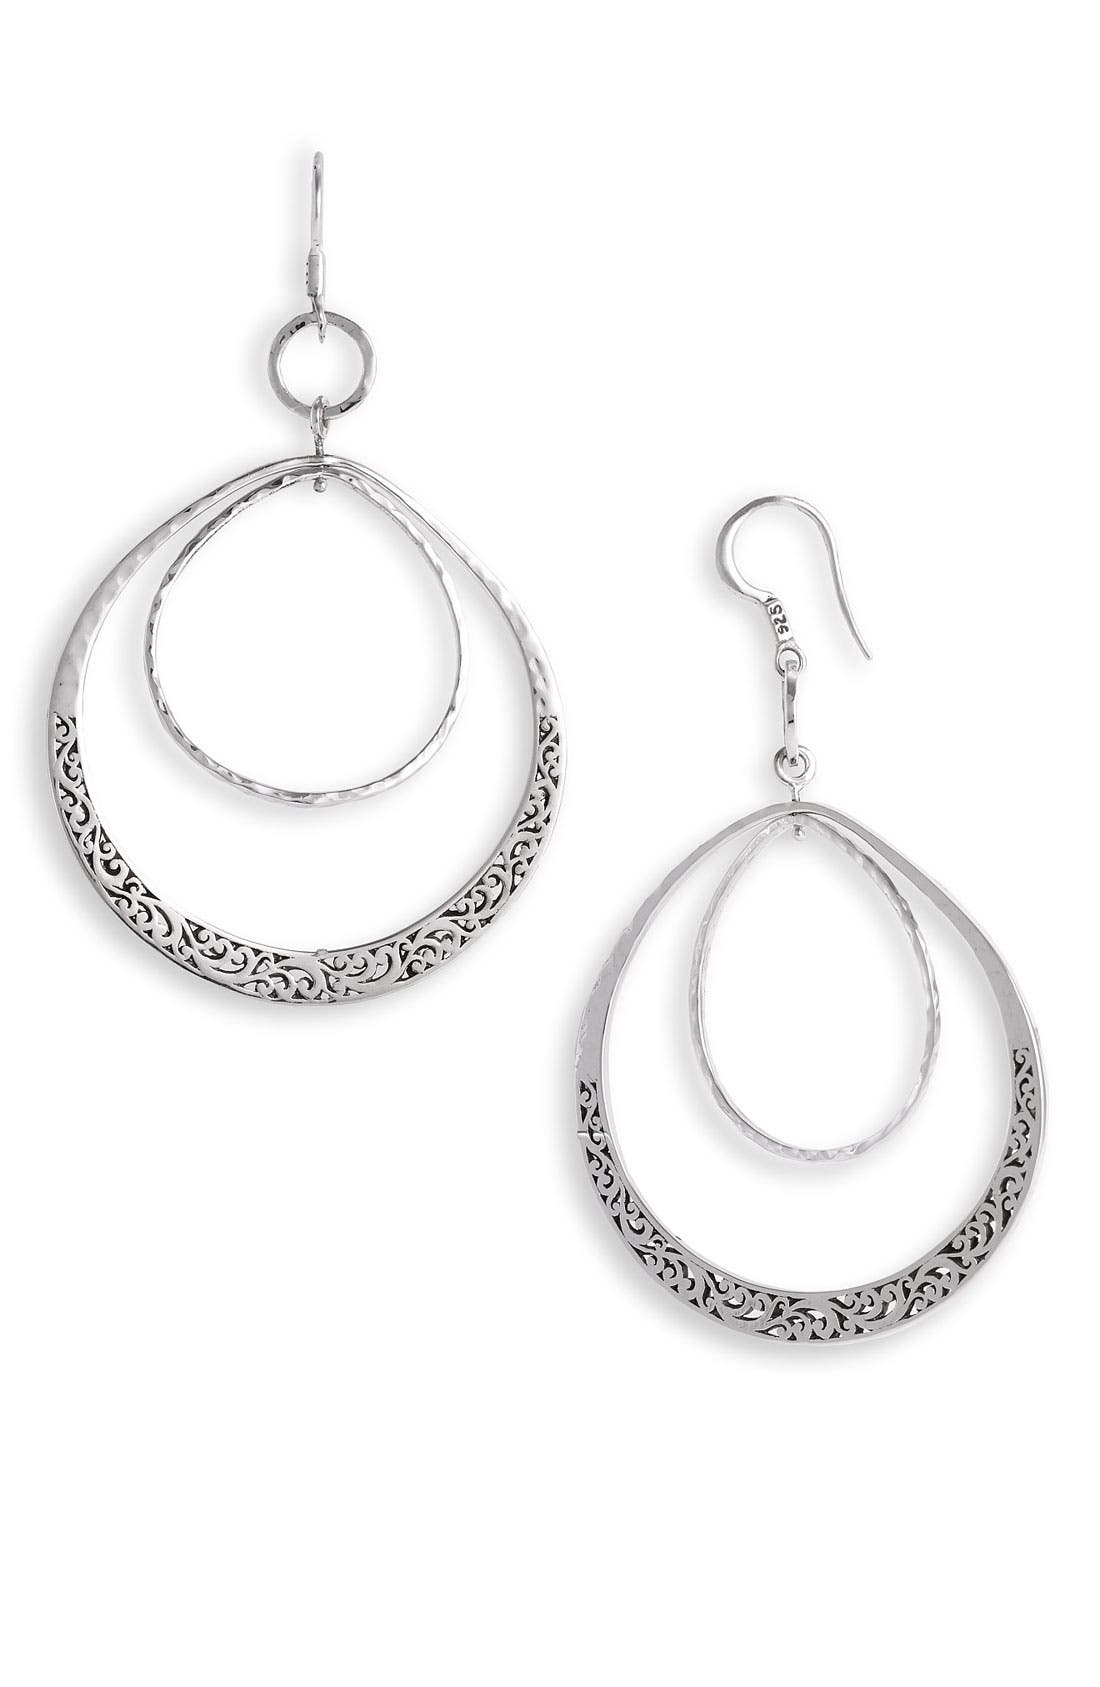 Main Image - Lois Hill 'Classics' Large Orbiting Teardrop Earrings